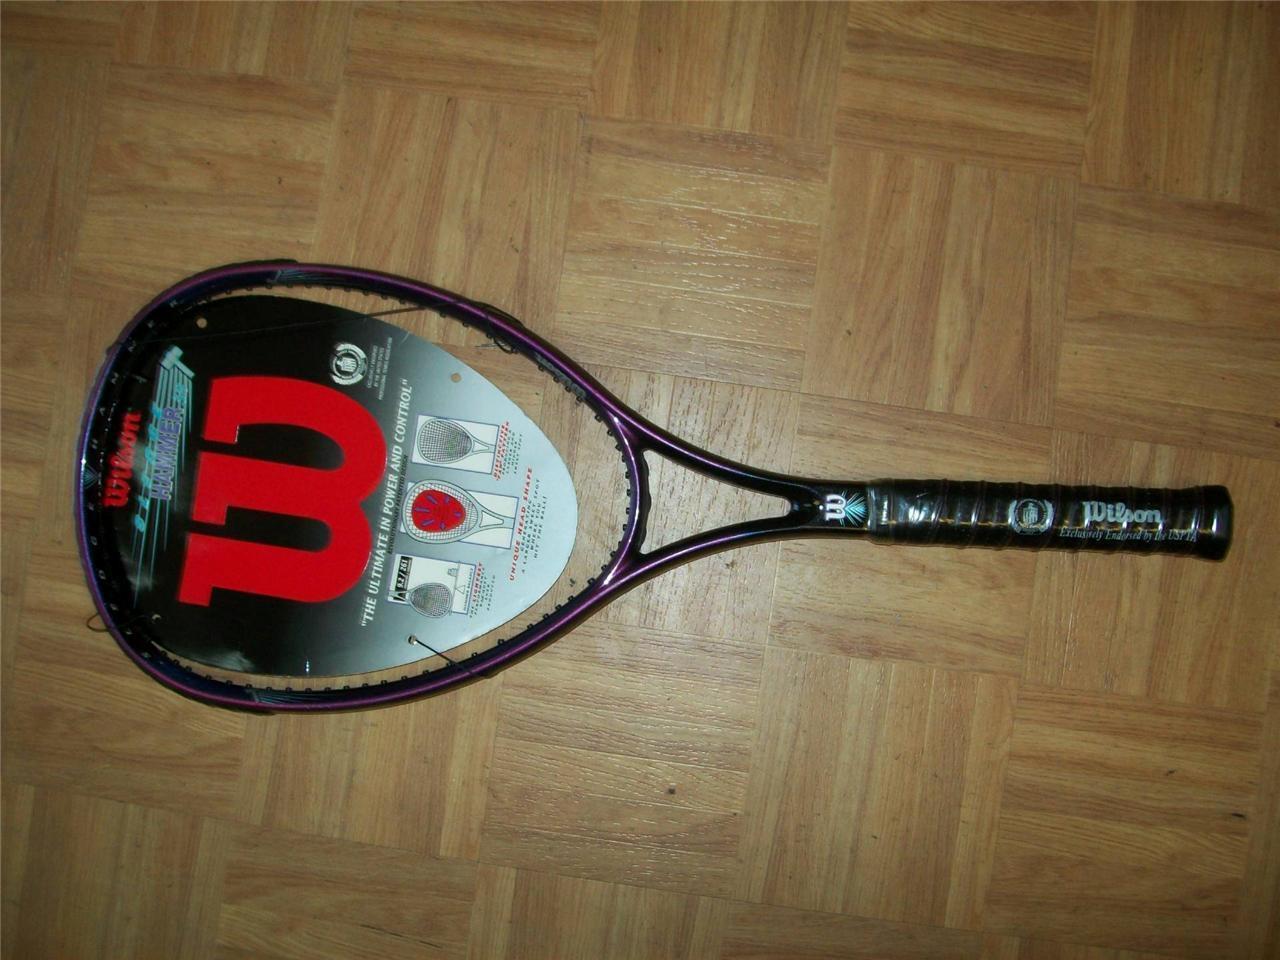 NEW Rare Wilson Sledge Hammer 3.8 Midplus 95 4 5 8 grip Tennis Racquet